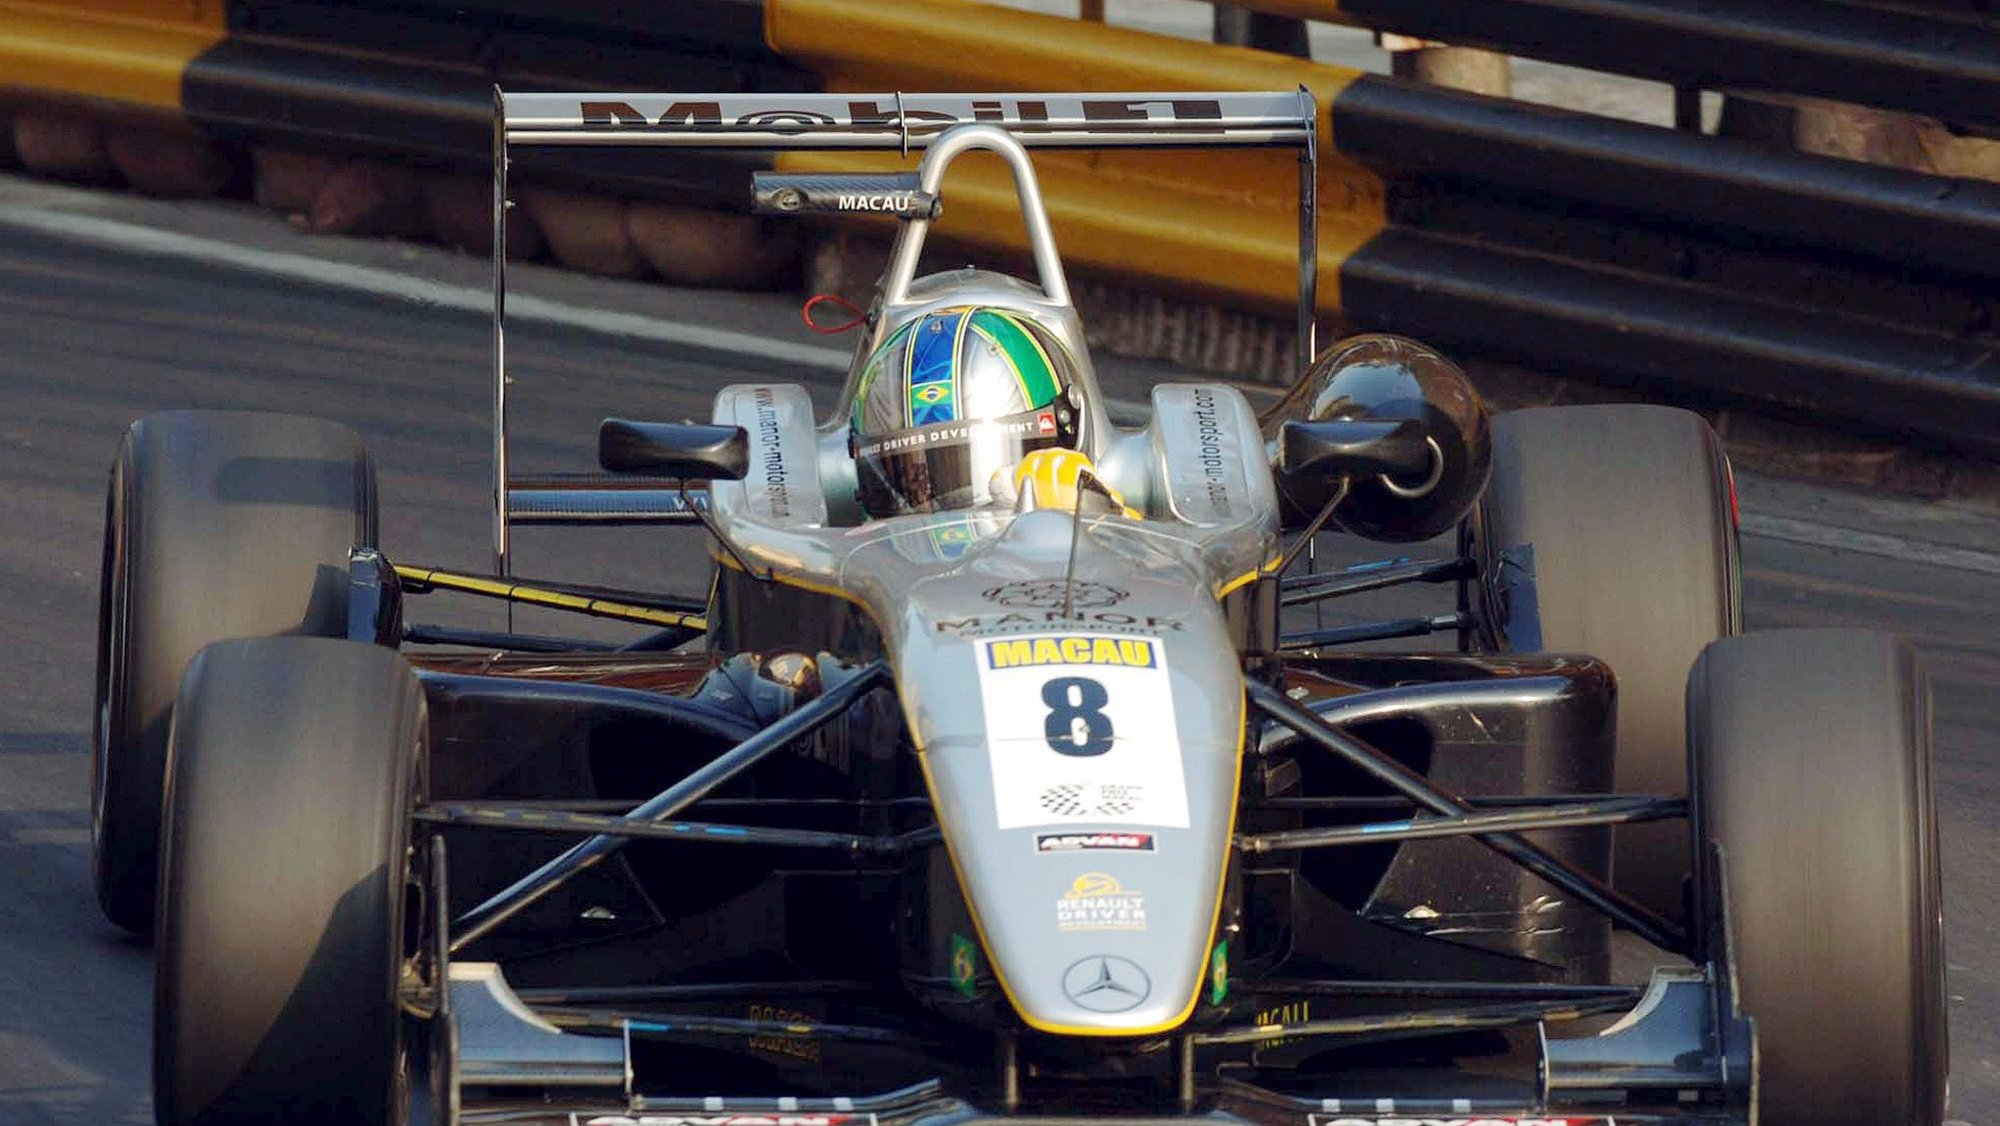 epa00578971 Brazilian F3 driver Lucas di Grassi in action on his way to win the FIA Formula 3 Intercontinental Cup race, at the Macau Grand Prix, in Macao, China, Sunday, 20 November 2005  EPA/CARMO CORREIA